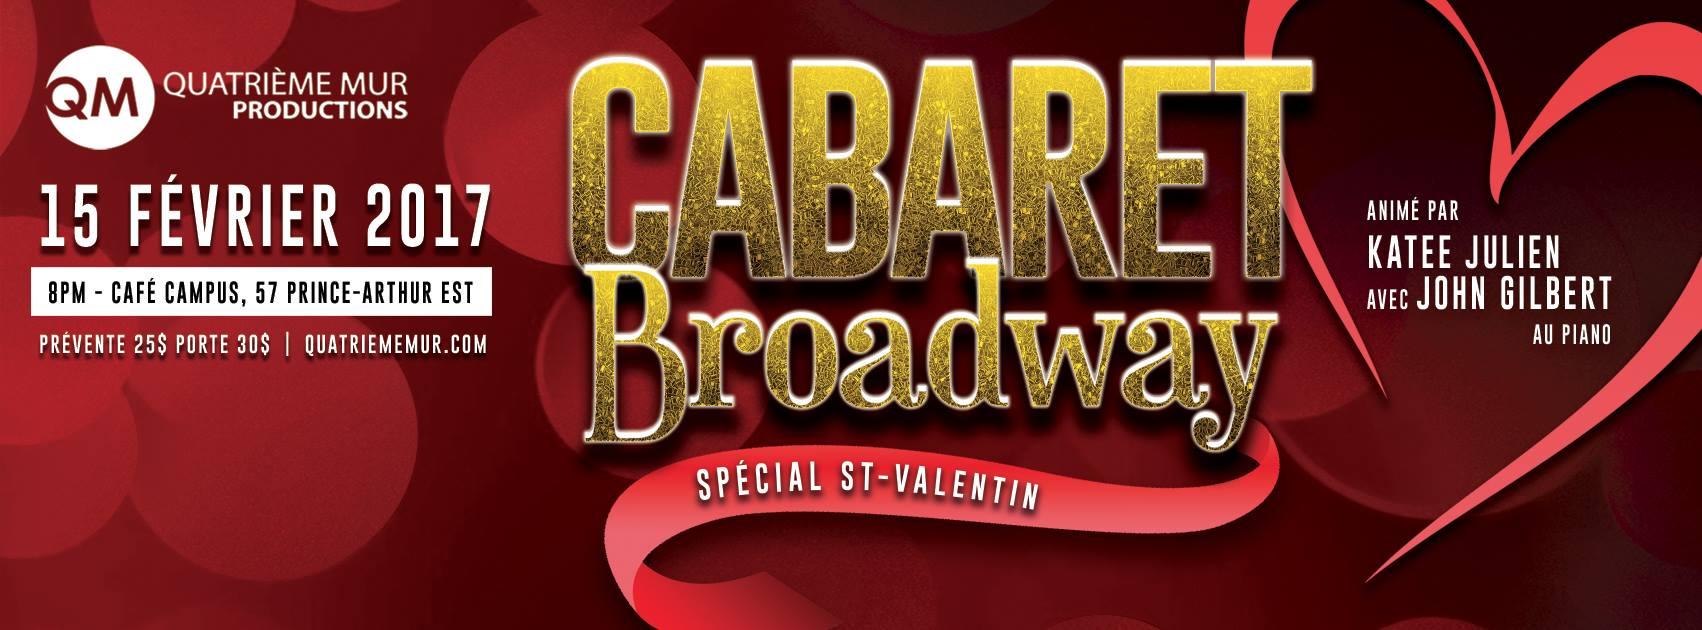 Cabaret Broadway – St-Valentin